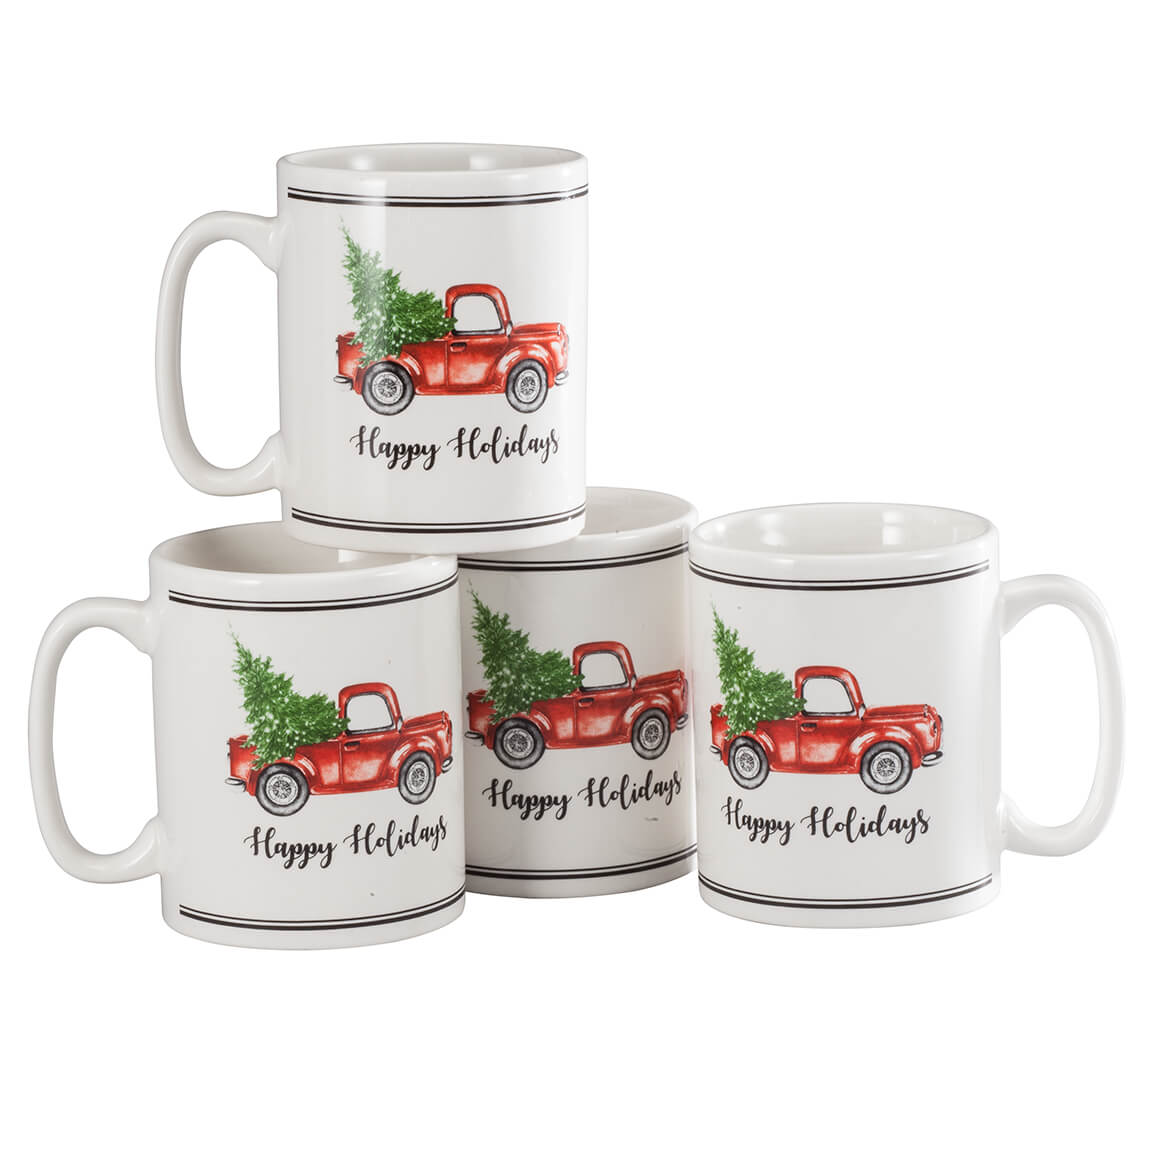 William Roberts Holiday Truck Mugs, Set of 4-364648